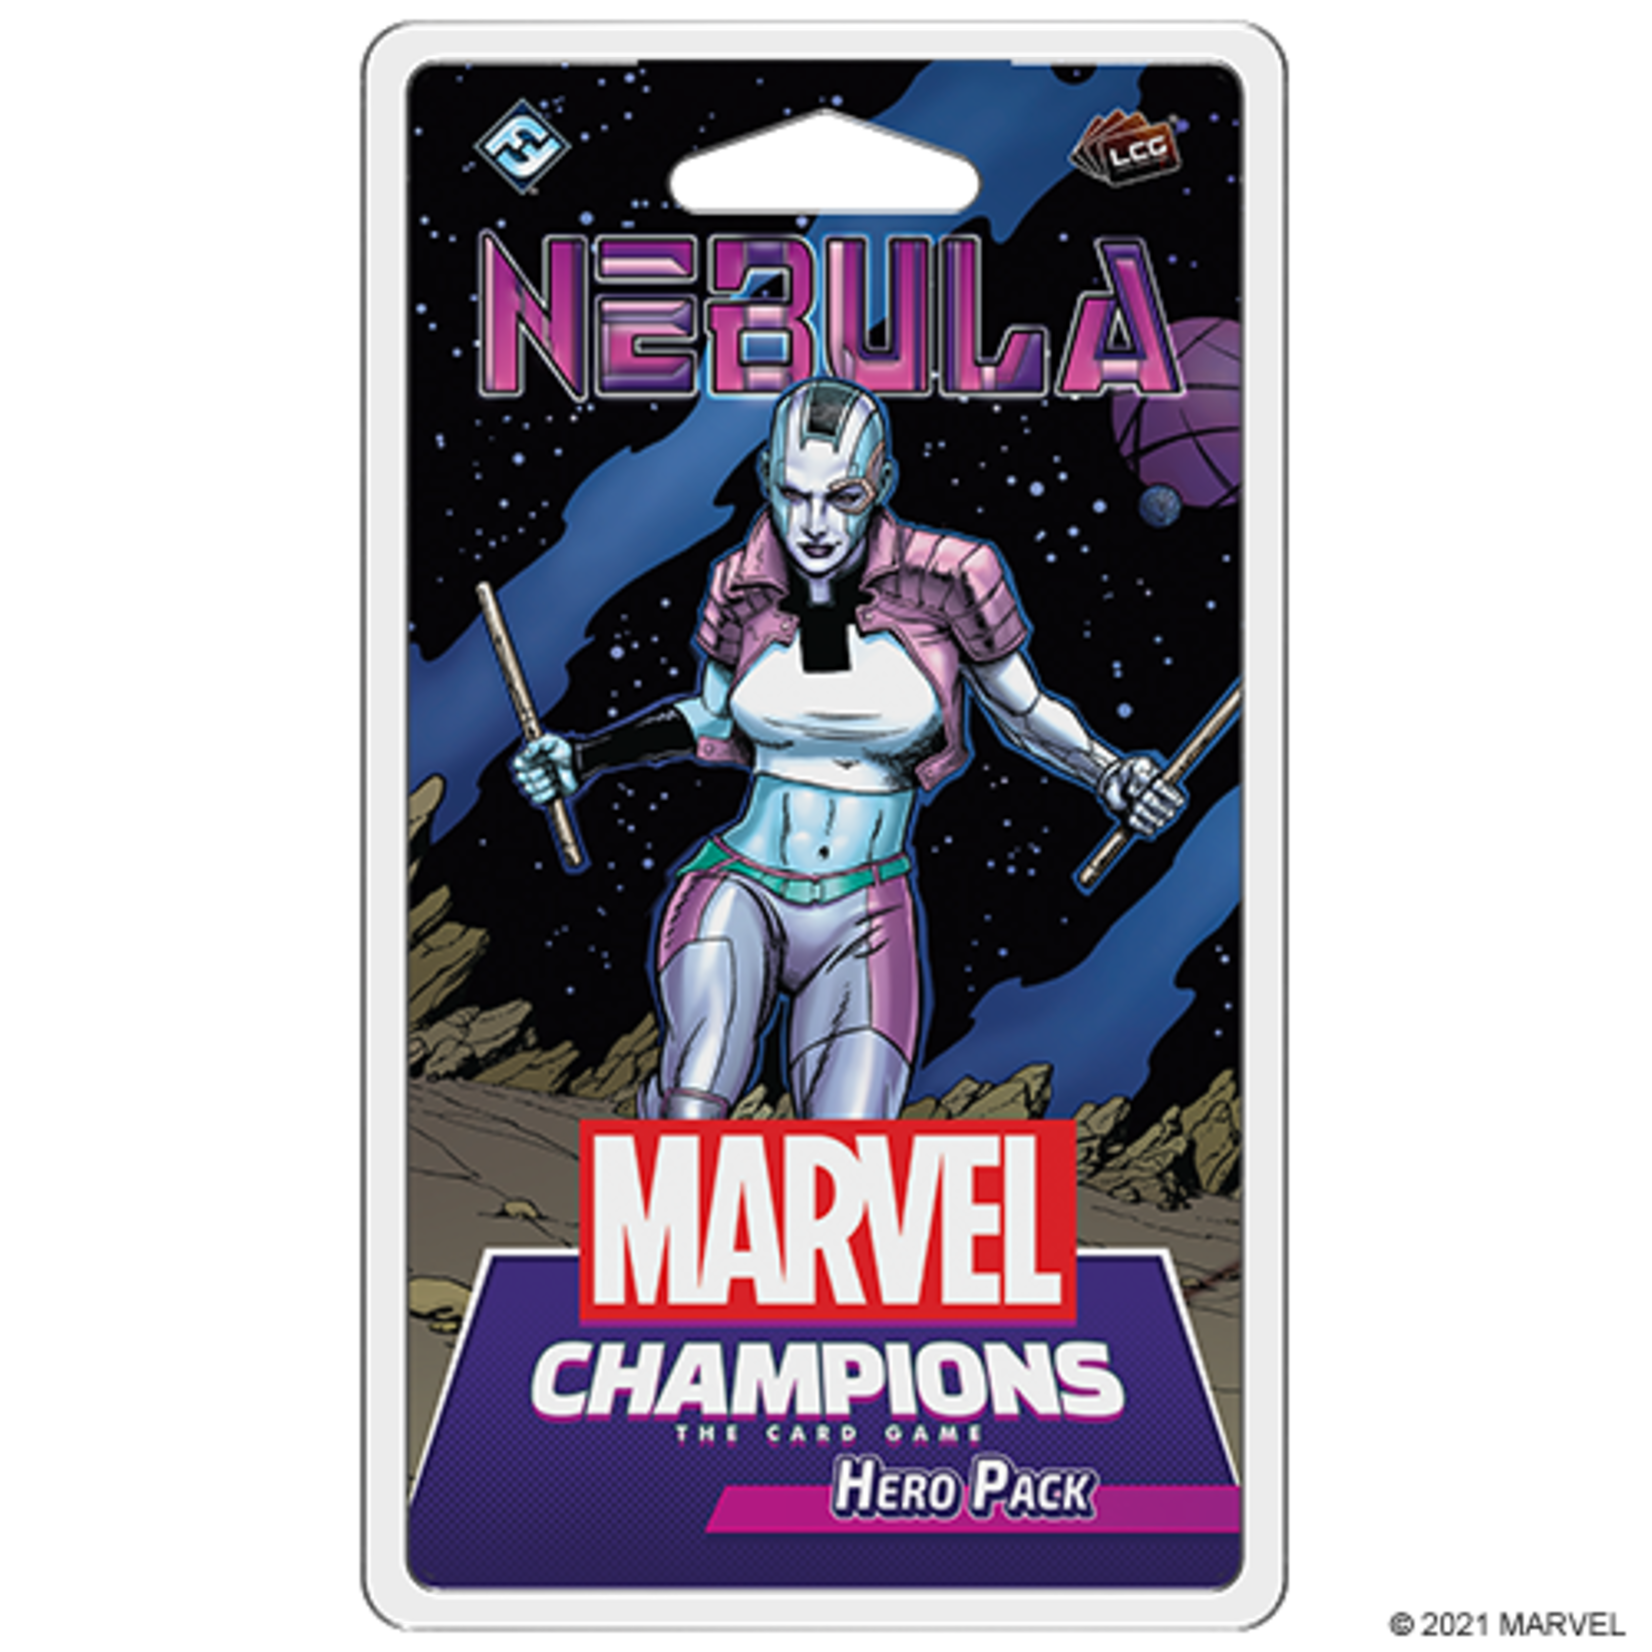 Fantasy Flight Games Marvel Champions LCG: Nebula Hero Pack